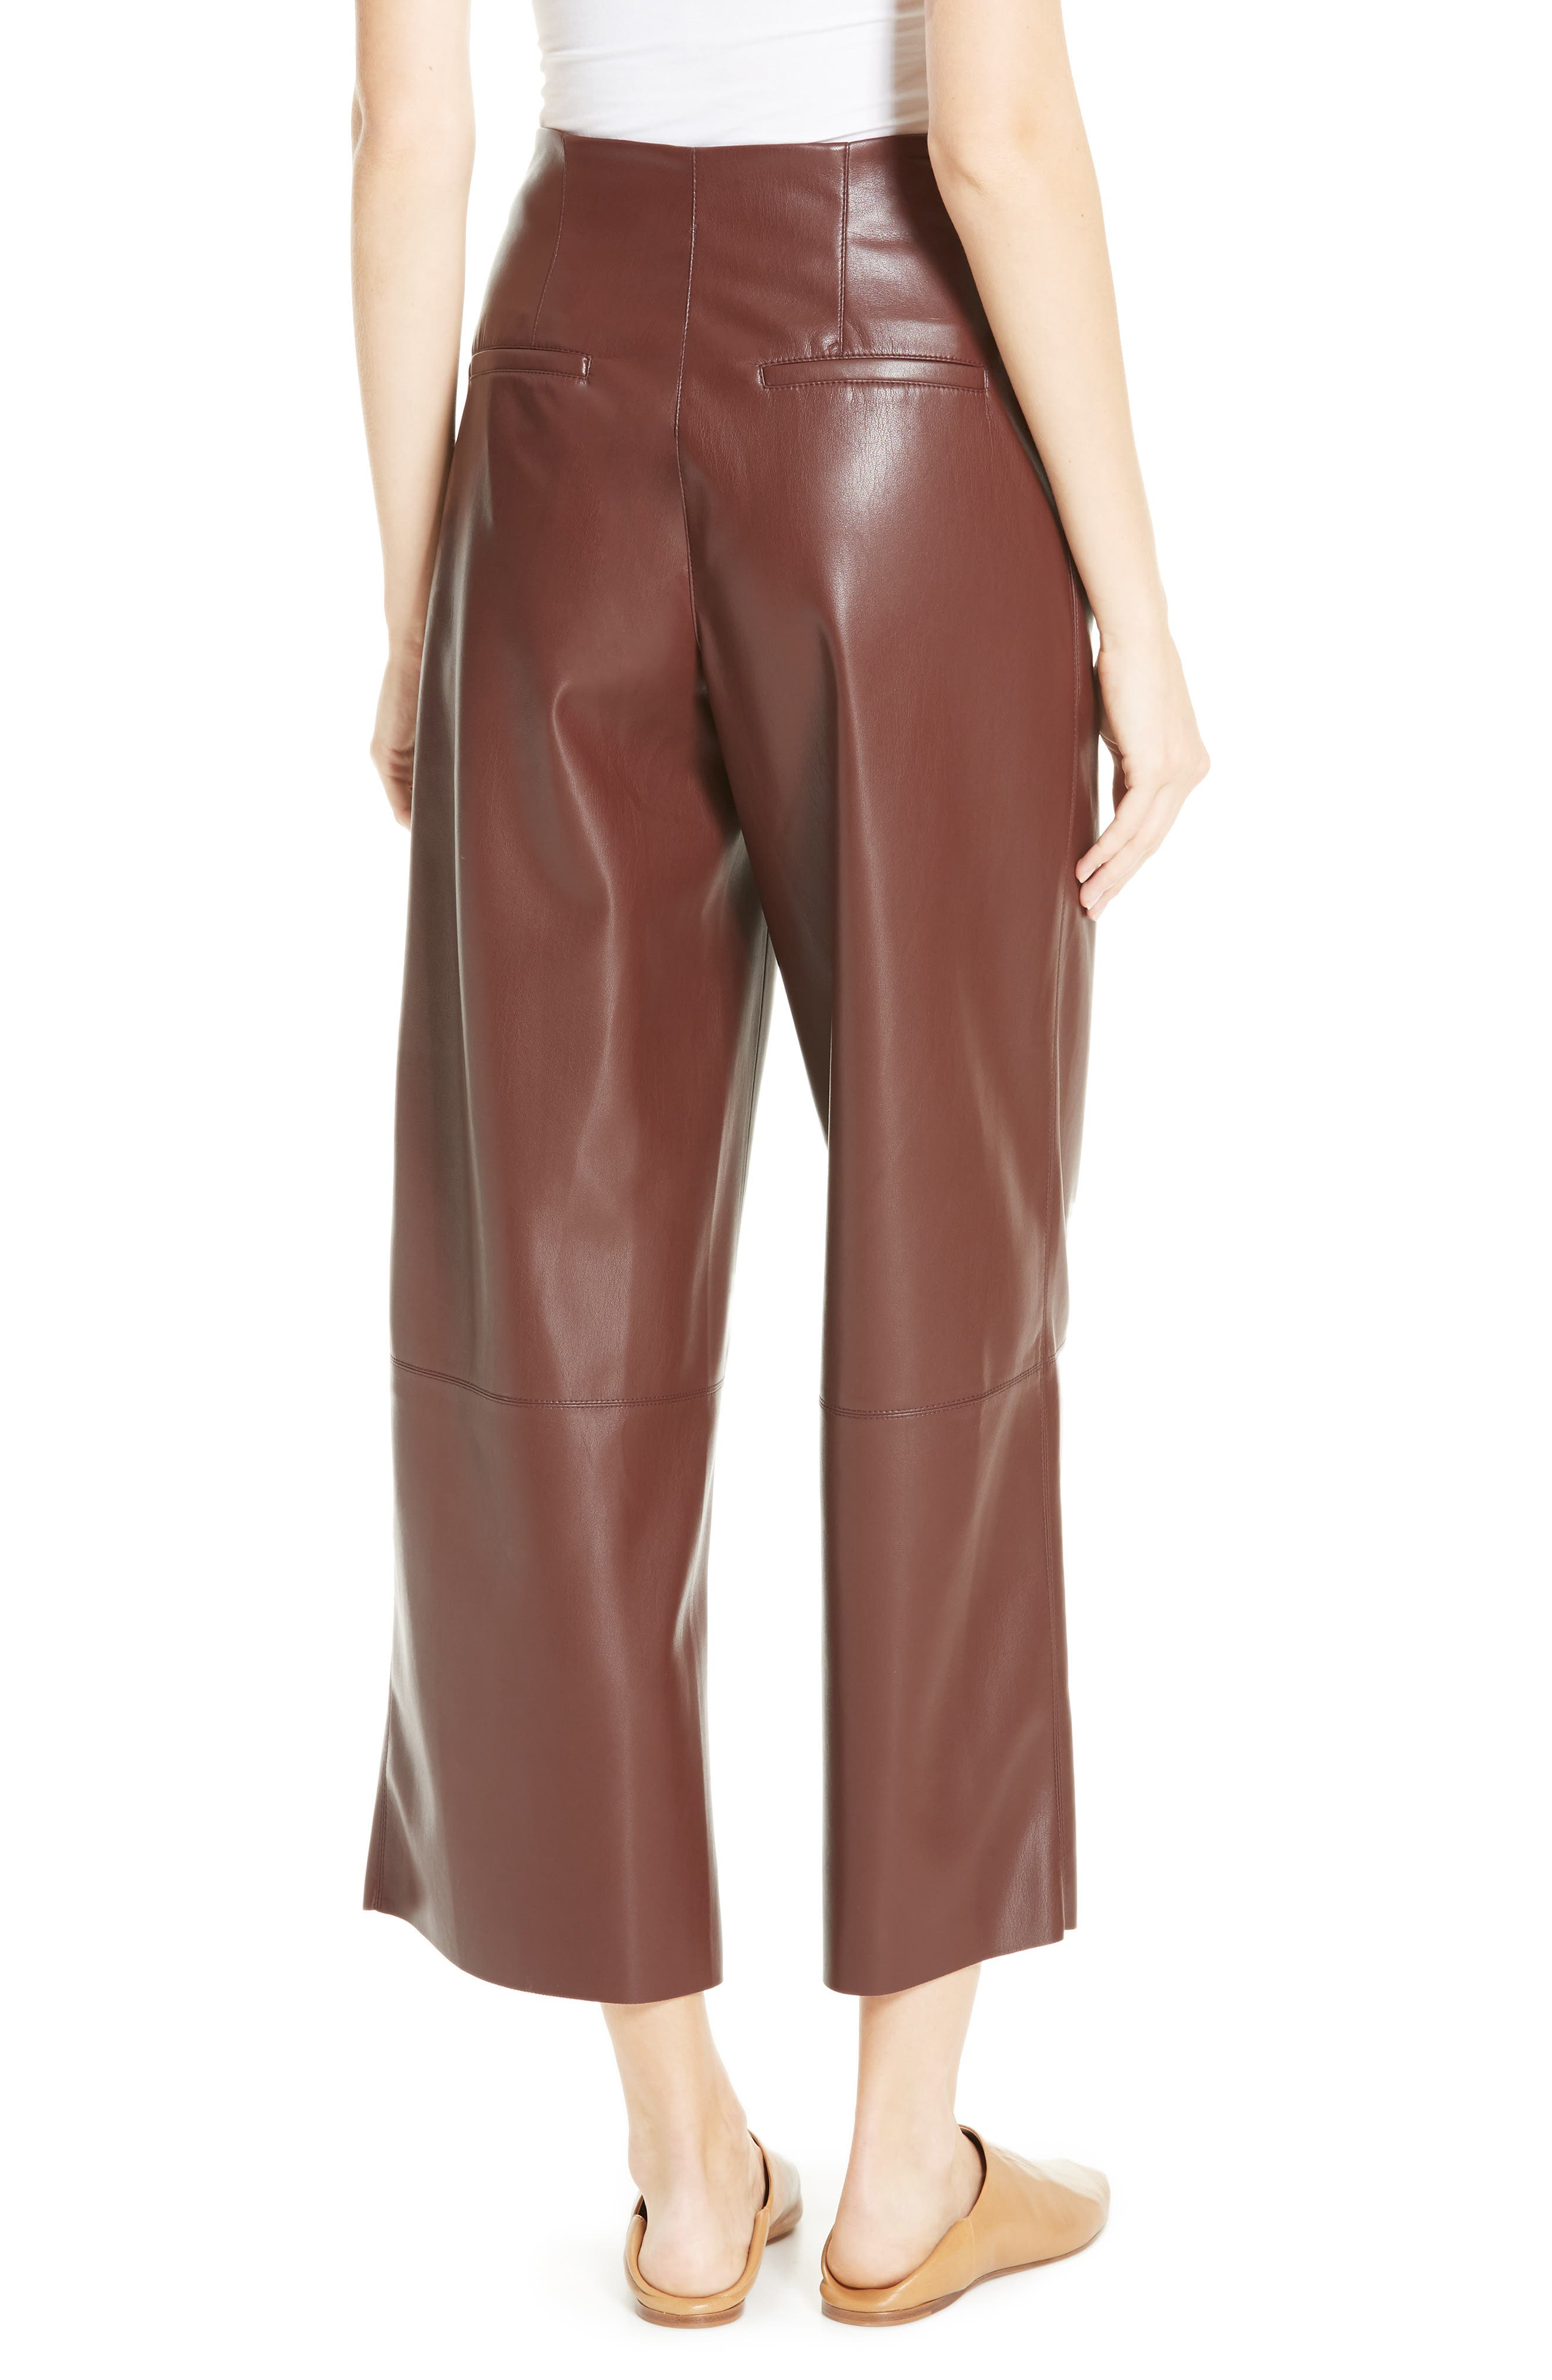 Africa Faux Leather Wide Leg Crop Pants,                             Alternate thumbnail 2, color,                             509